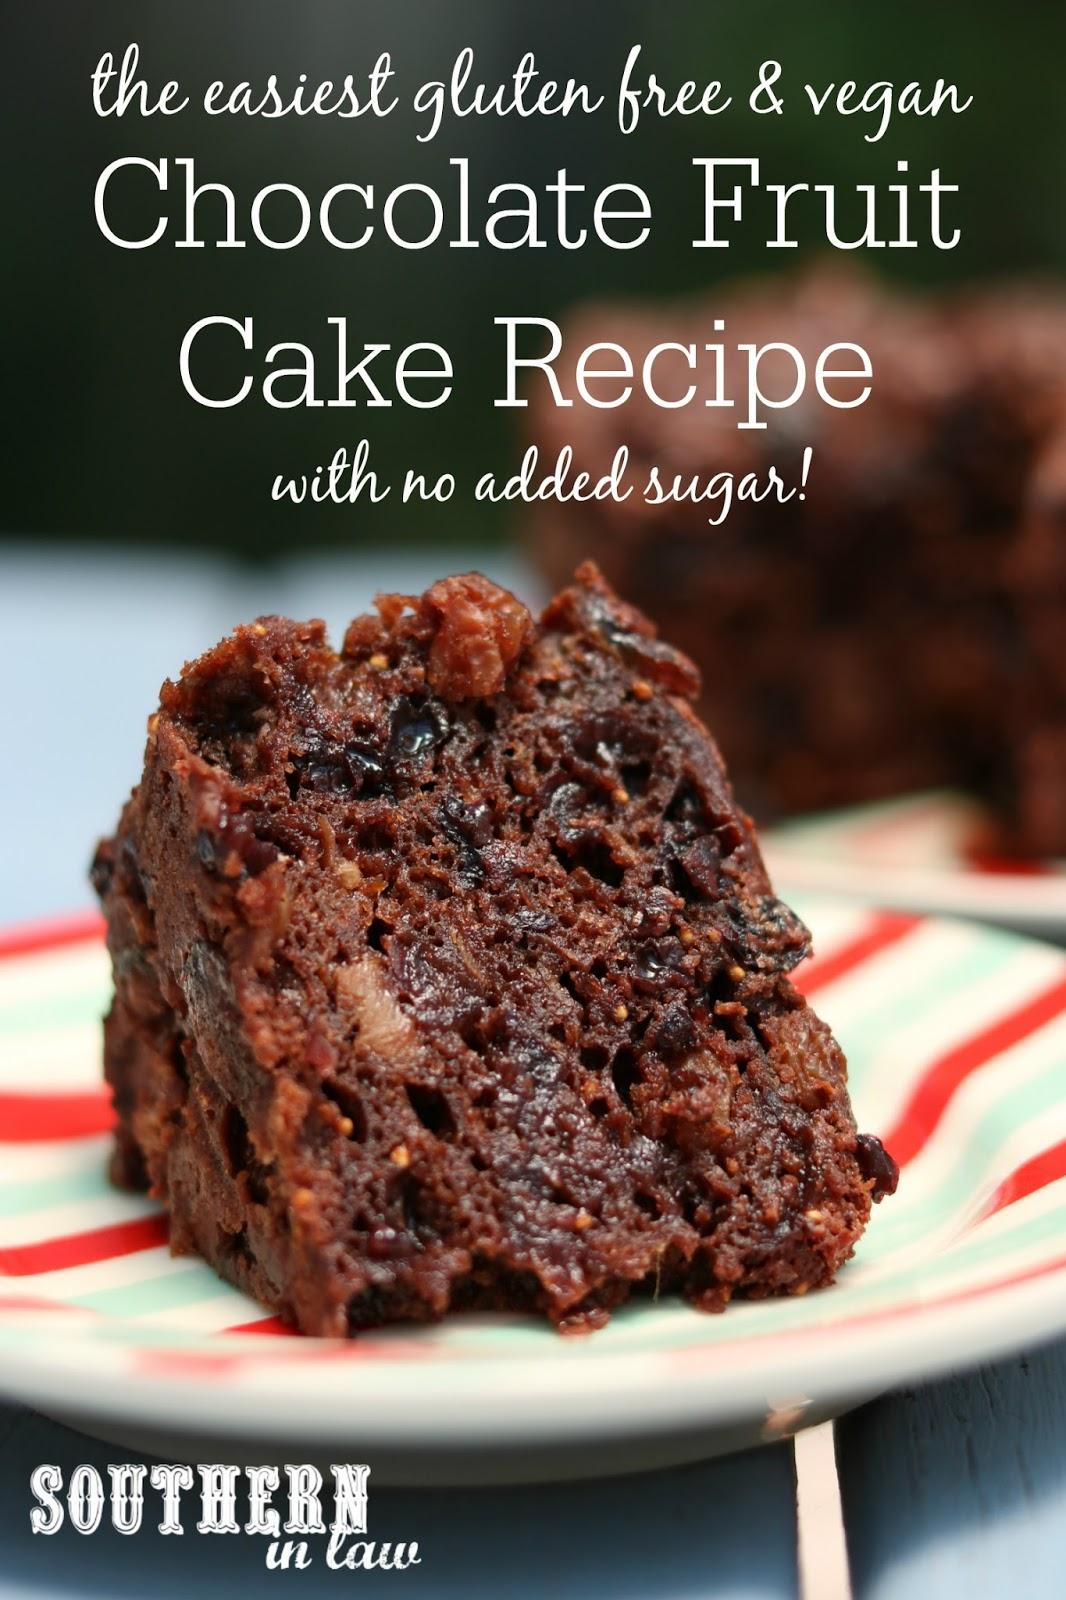 Southern In Law Recipe Easy 4 Ingredient Chocolate Fruit Cake Gluten Free Vegan No Added Sugar